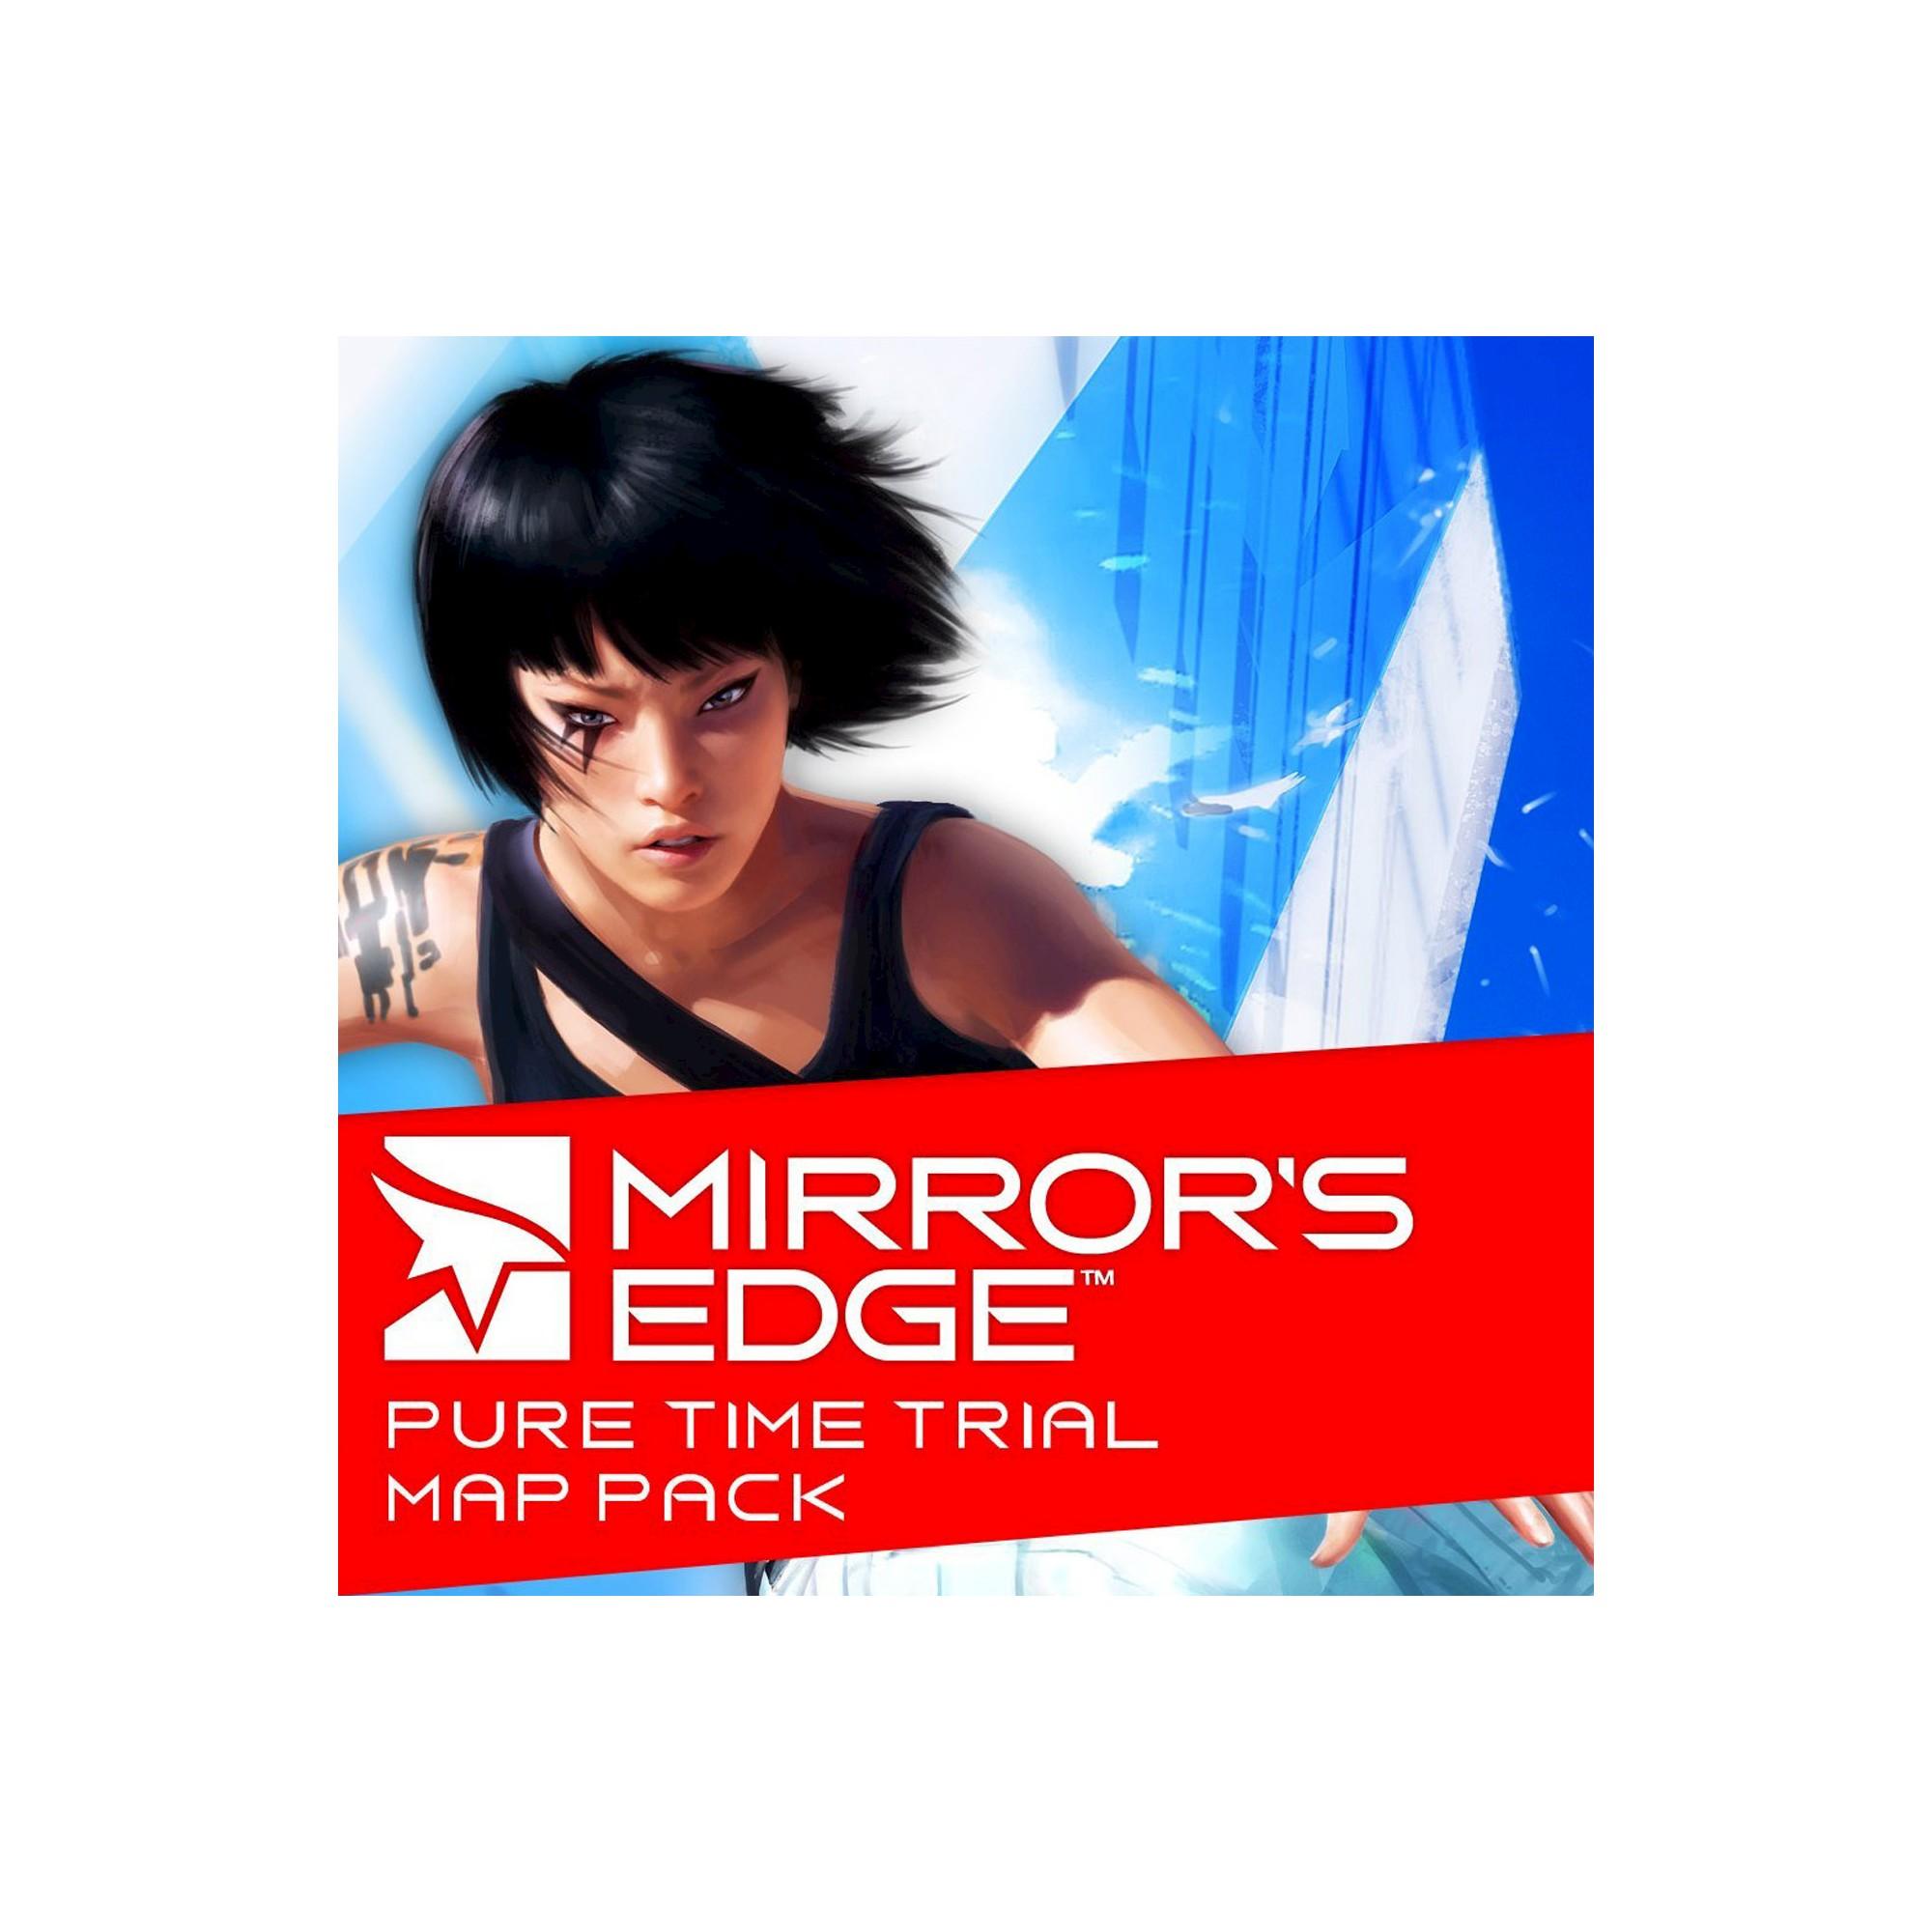 Mirrors edge скачать карту